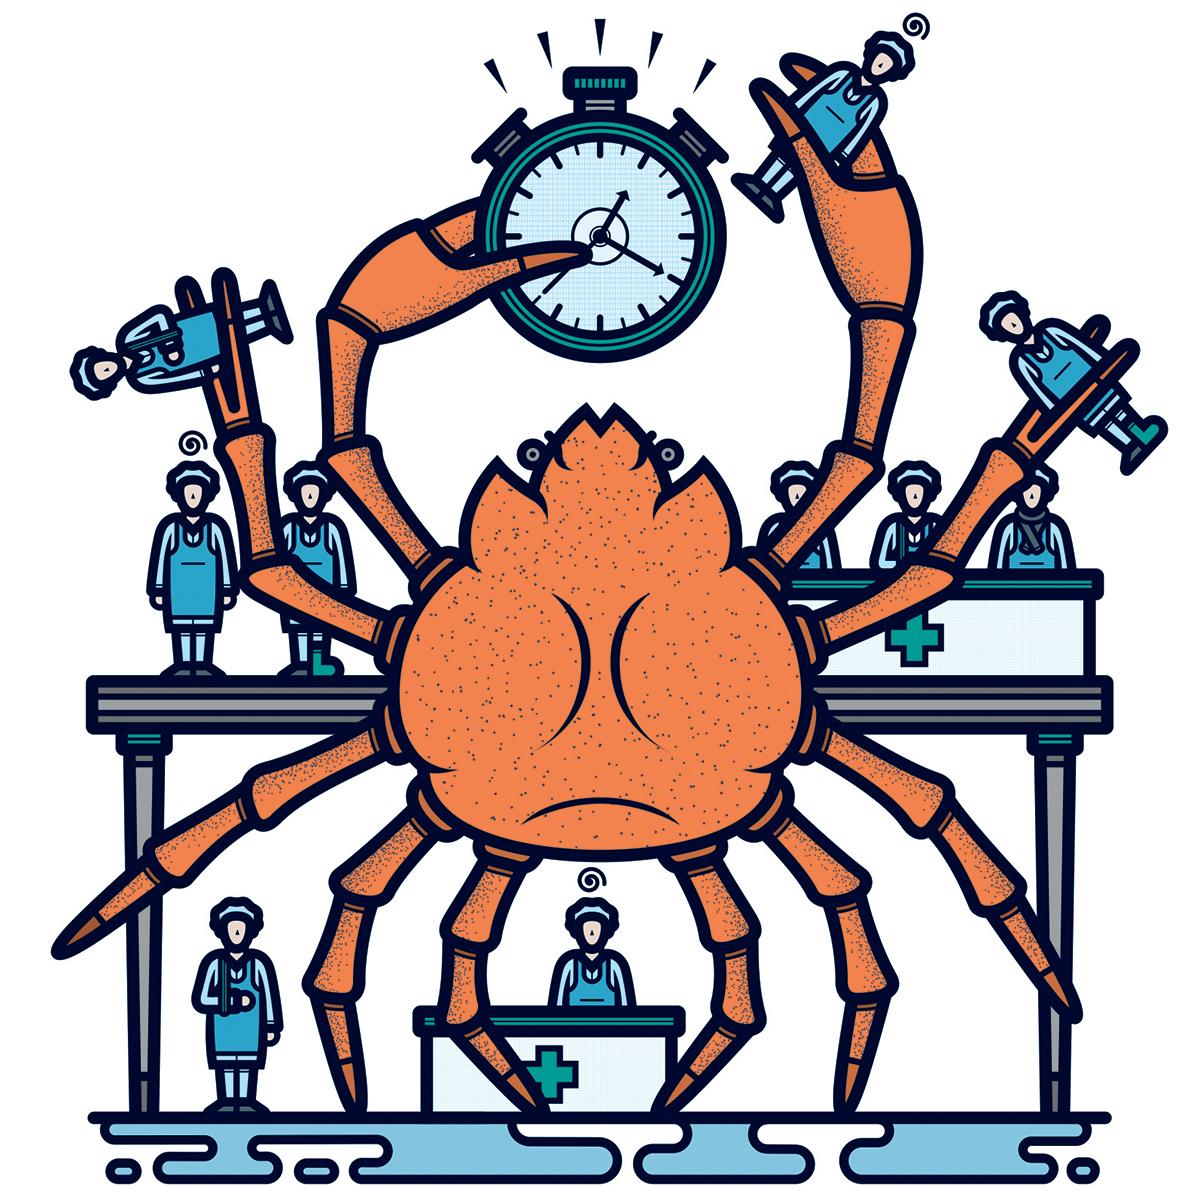 Garance-Grégoire-Gicquel-ST-Crab